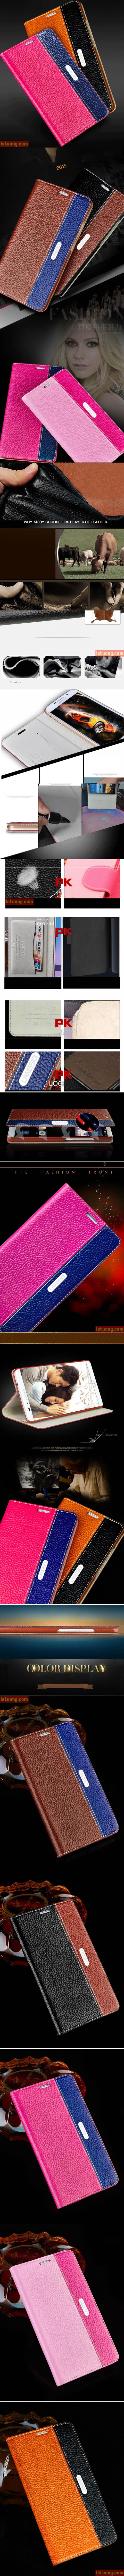 Bao da Sony M4 Aqua Langside da thật 100%, thời trang 5